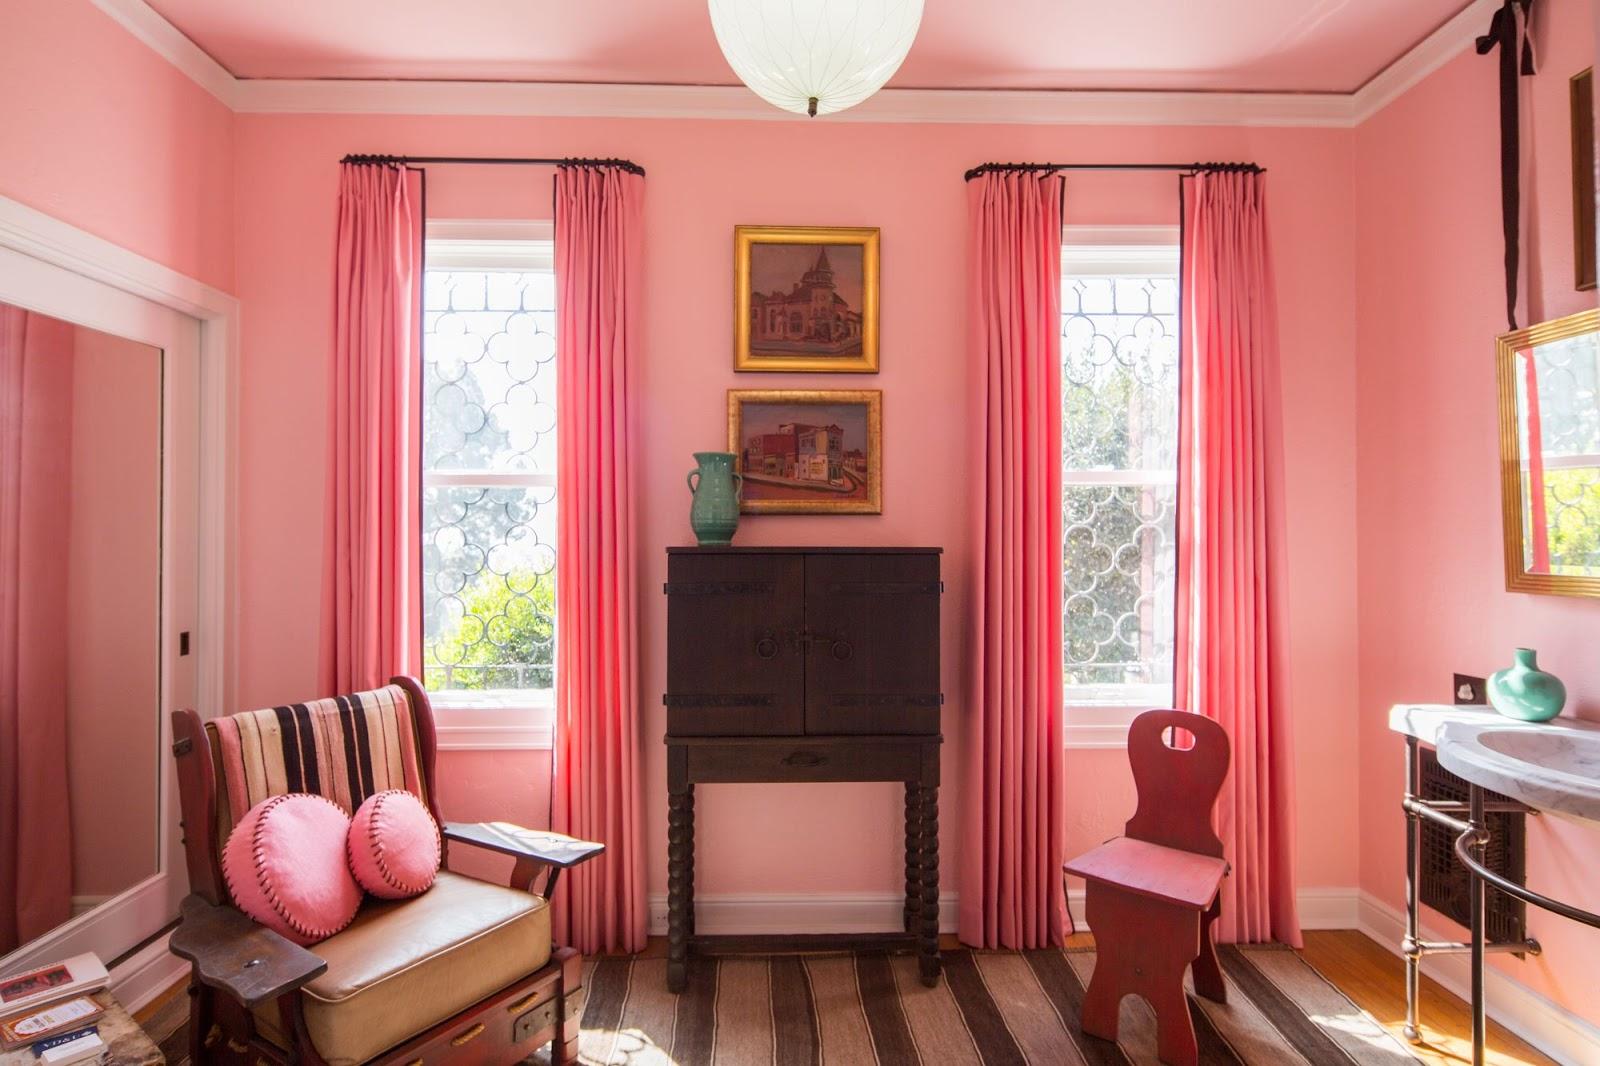 Fiorito Interior Design: Wattles Mansion Showcase House, Los Angeles ...